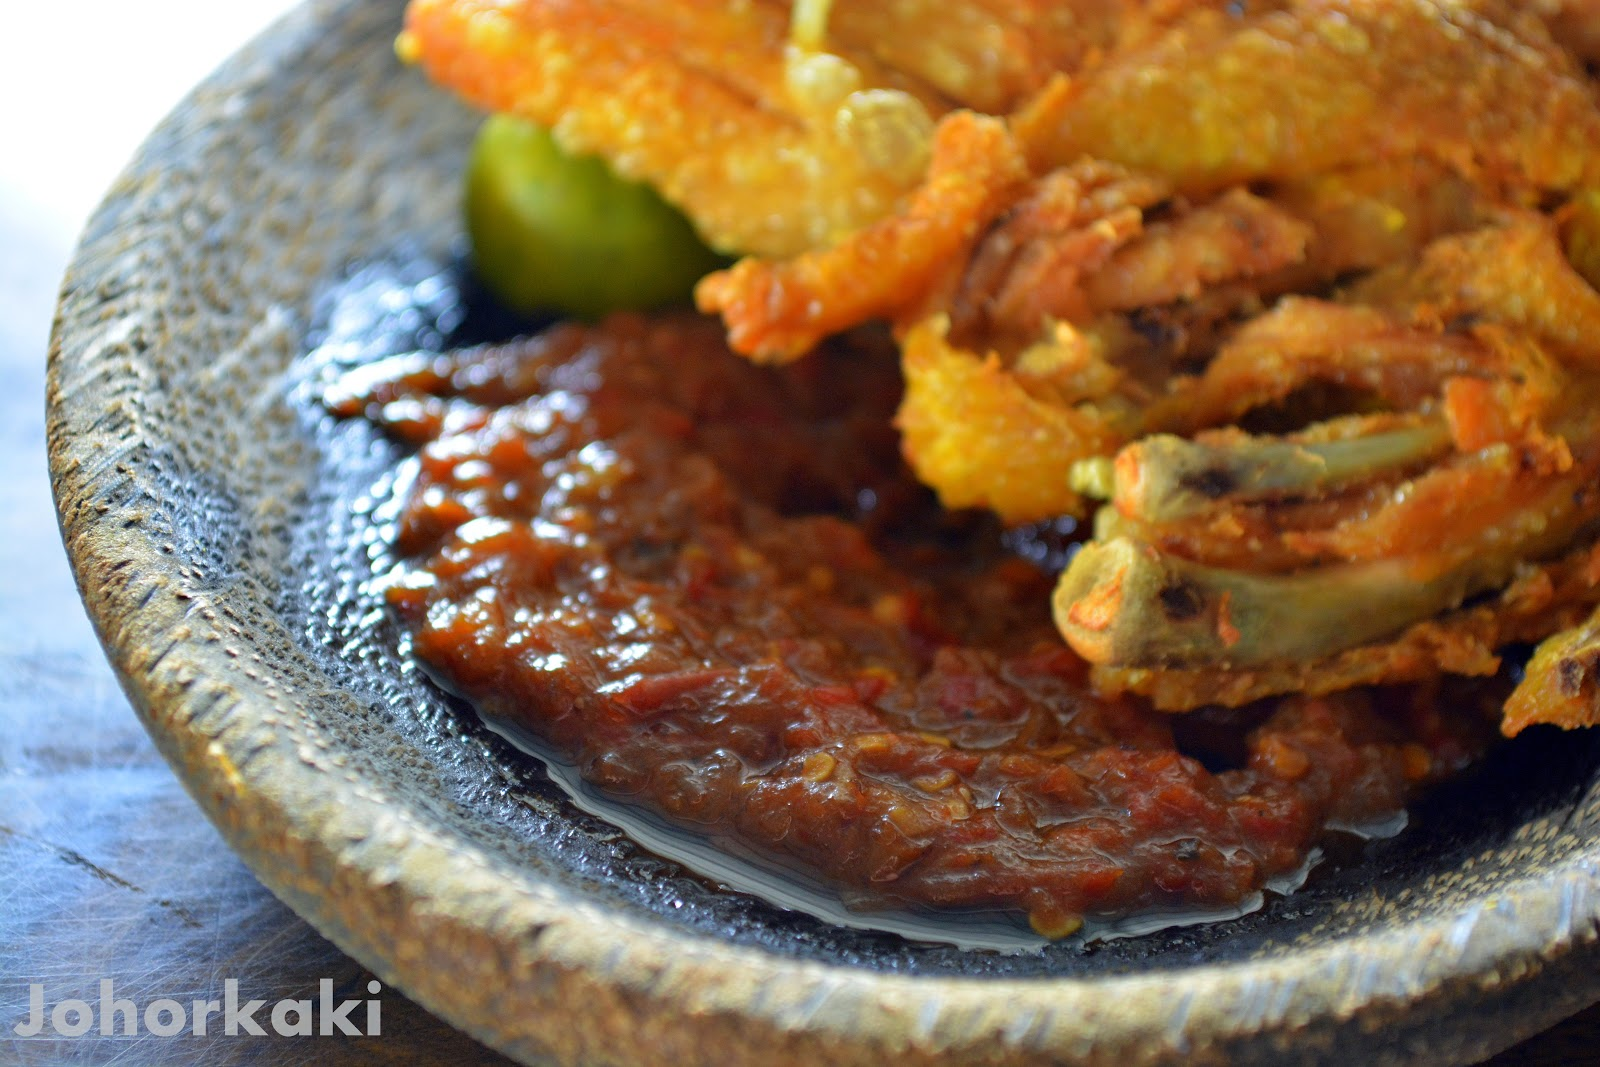 Warung Top 10 Ayam Penyet and Ais Buah in Johor Bahru  : DSC0055jk from johorkaki.blogspot.ca size 1600 x 1067 jpeg 281kB